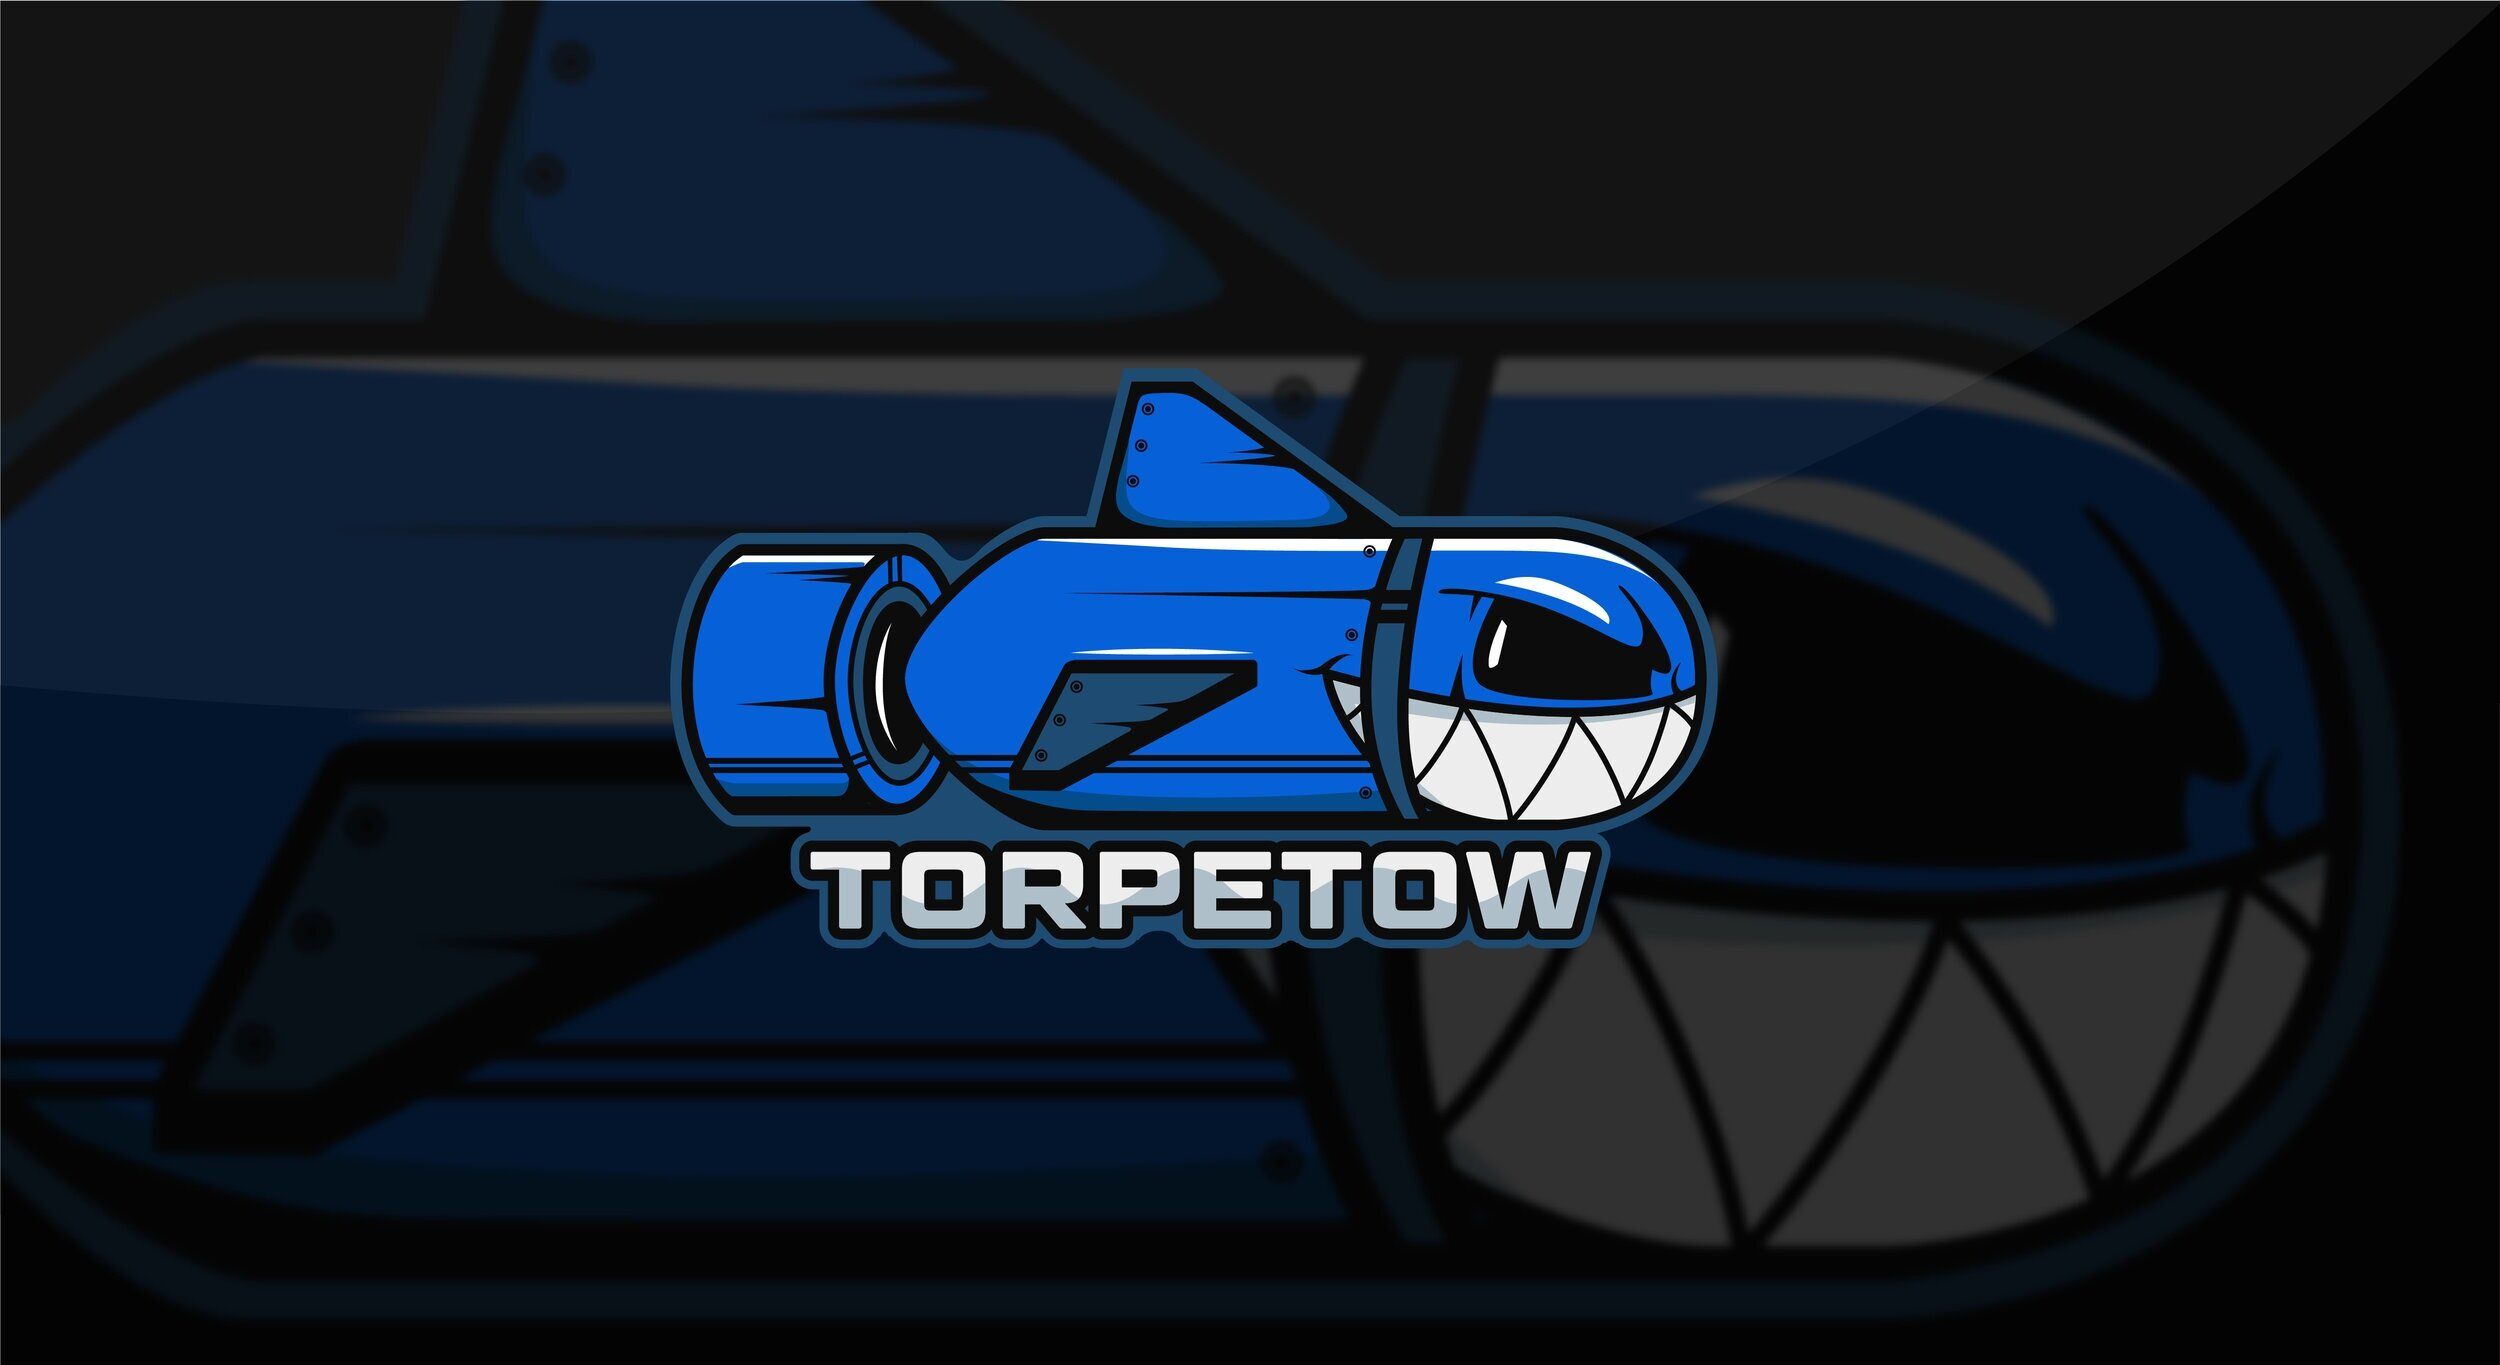 190920_Single_Torpedo_Rebrand_With_Text_and_BG.jpg